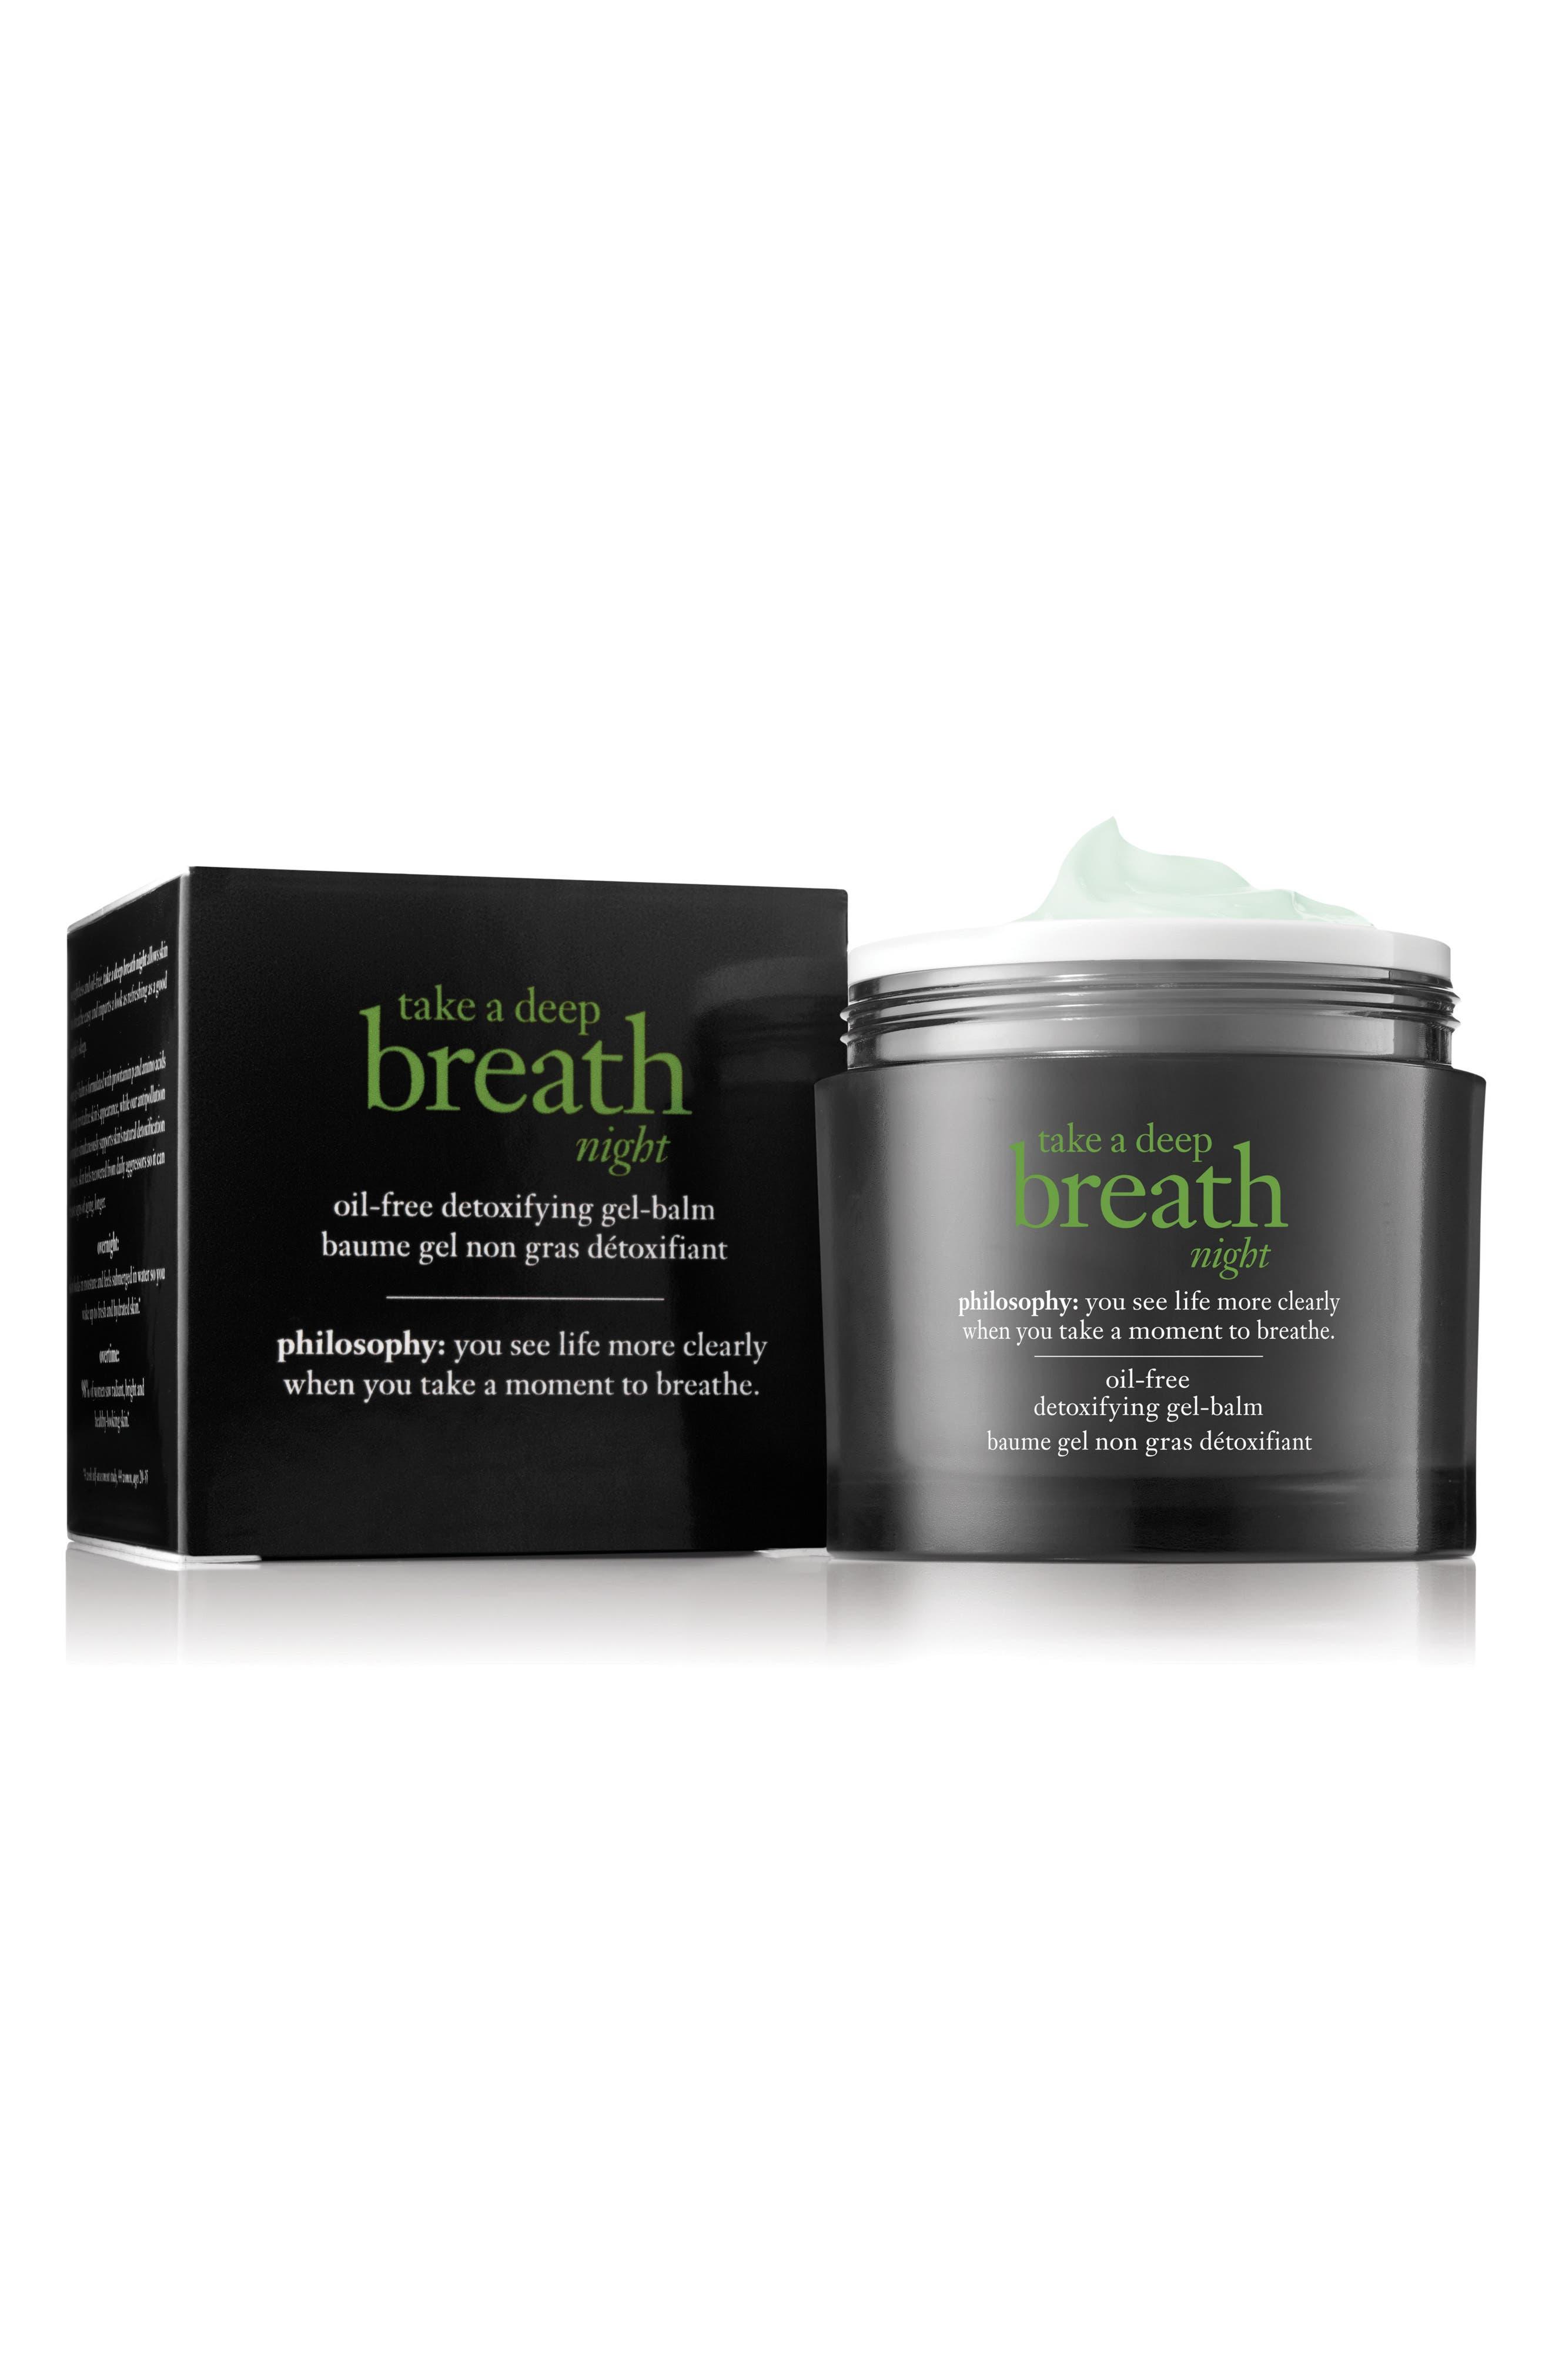 Main Image - philosophy take a deep breath oil-free detoxifying night balm